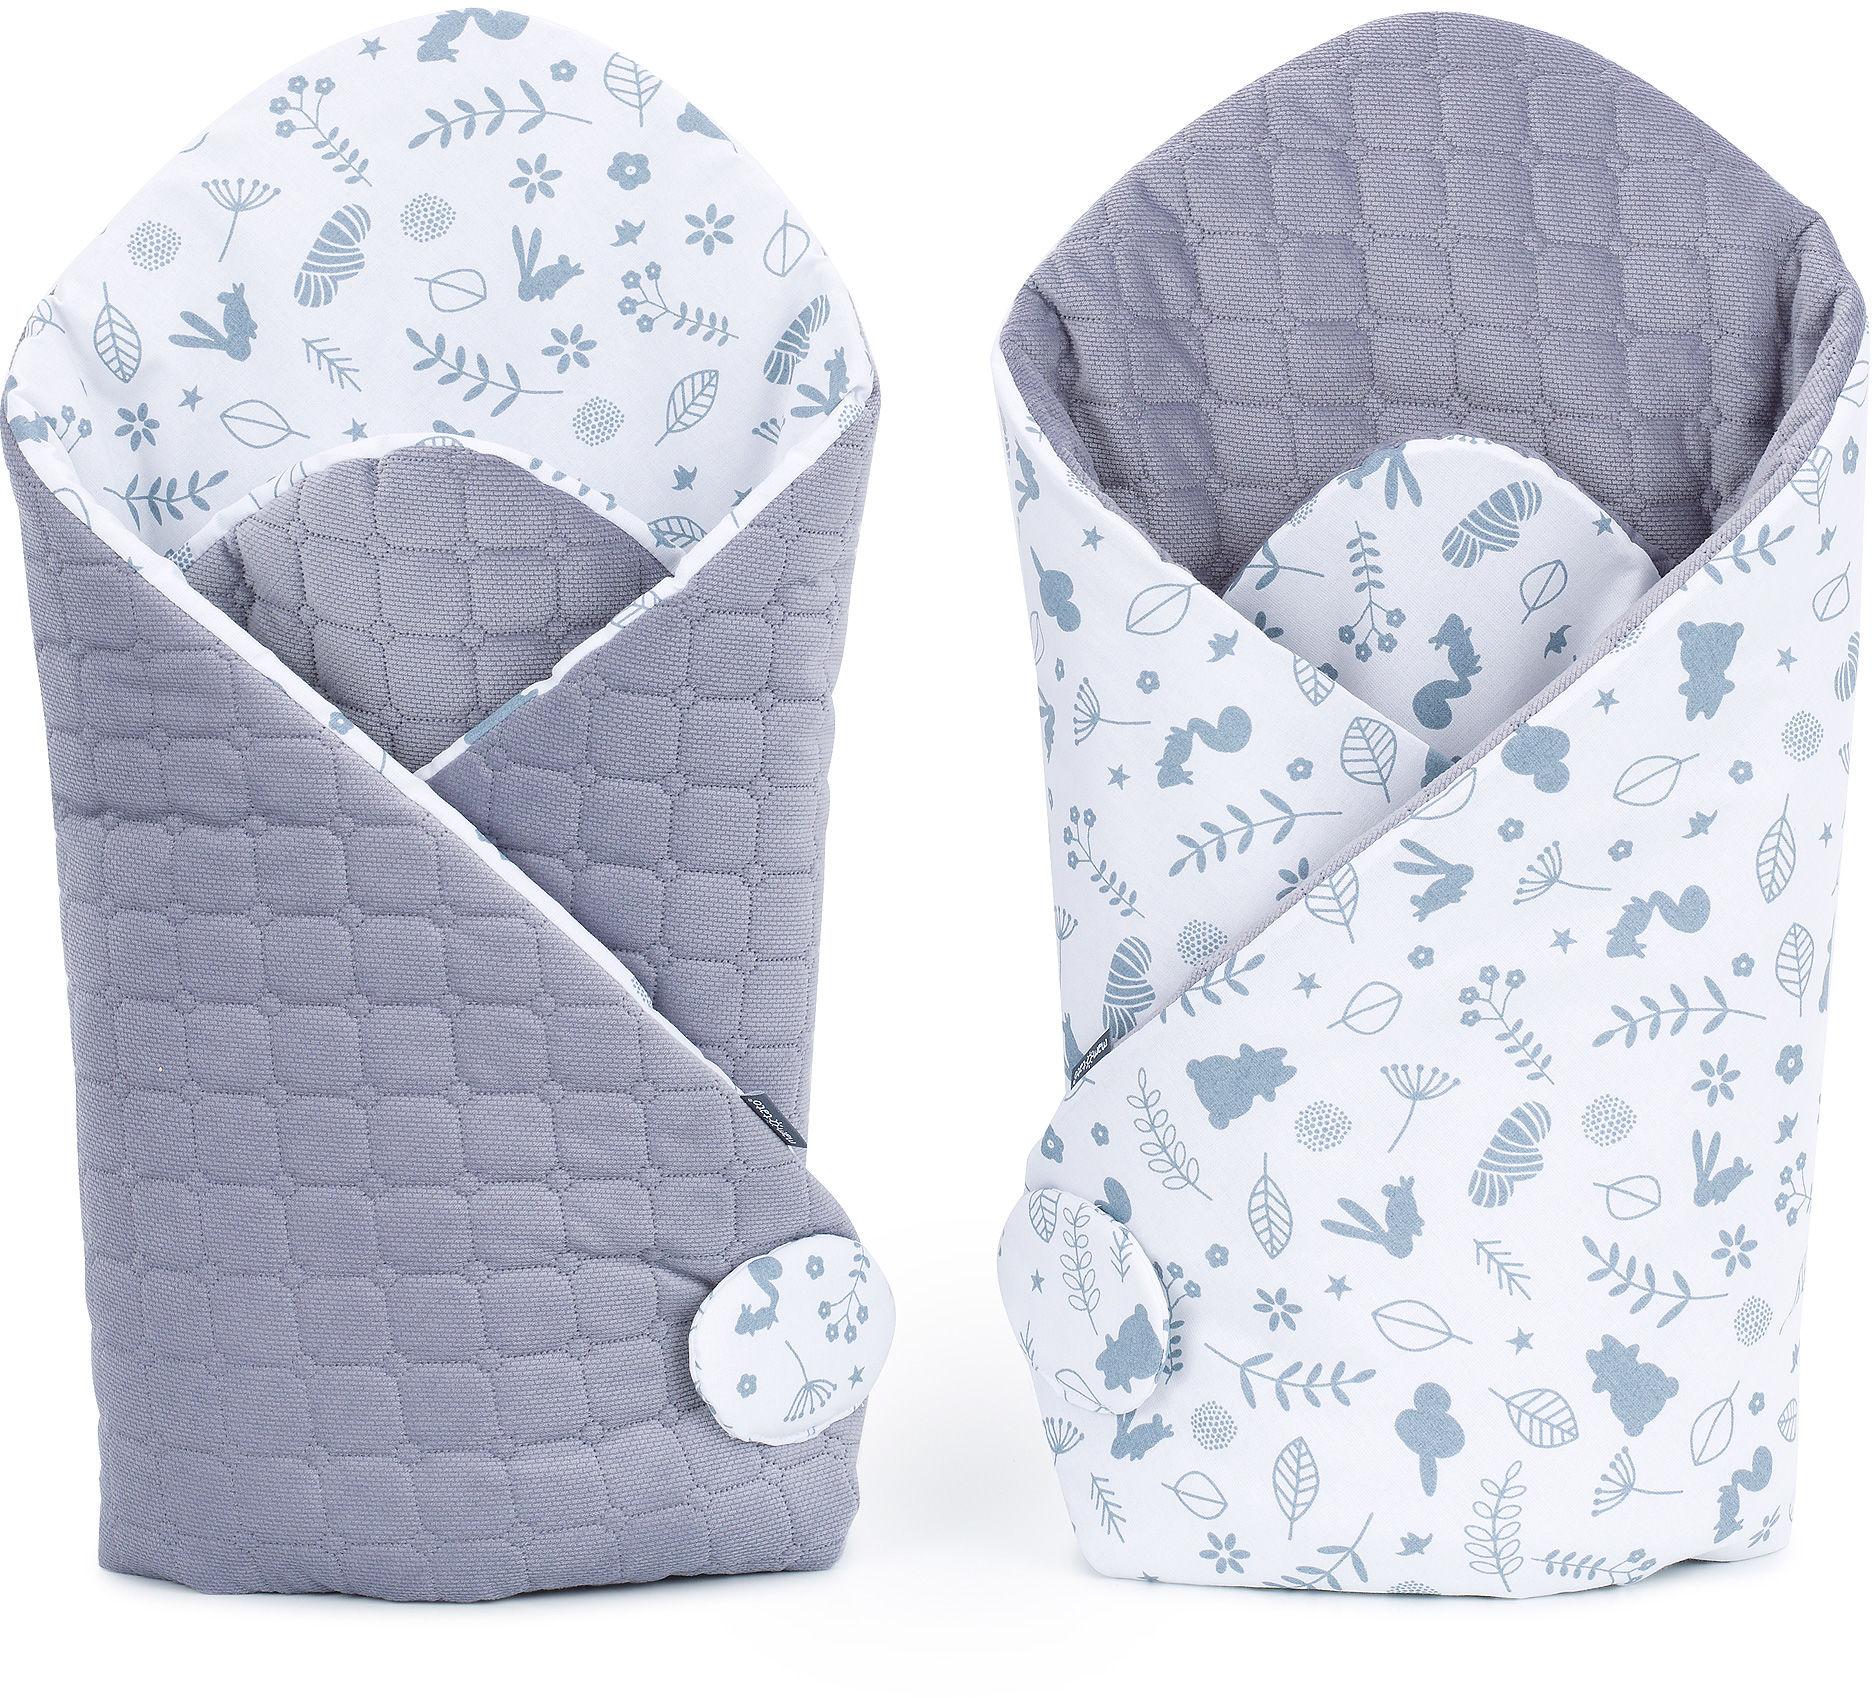 MAMO-TATO Rożek niemowlęcy dwustronny velvet - Las / szary